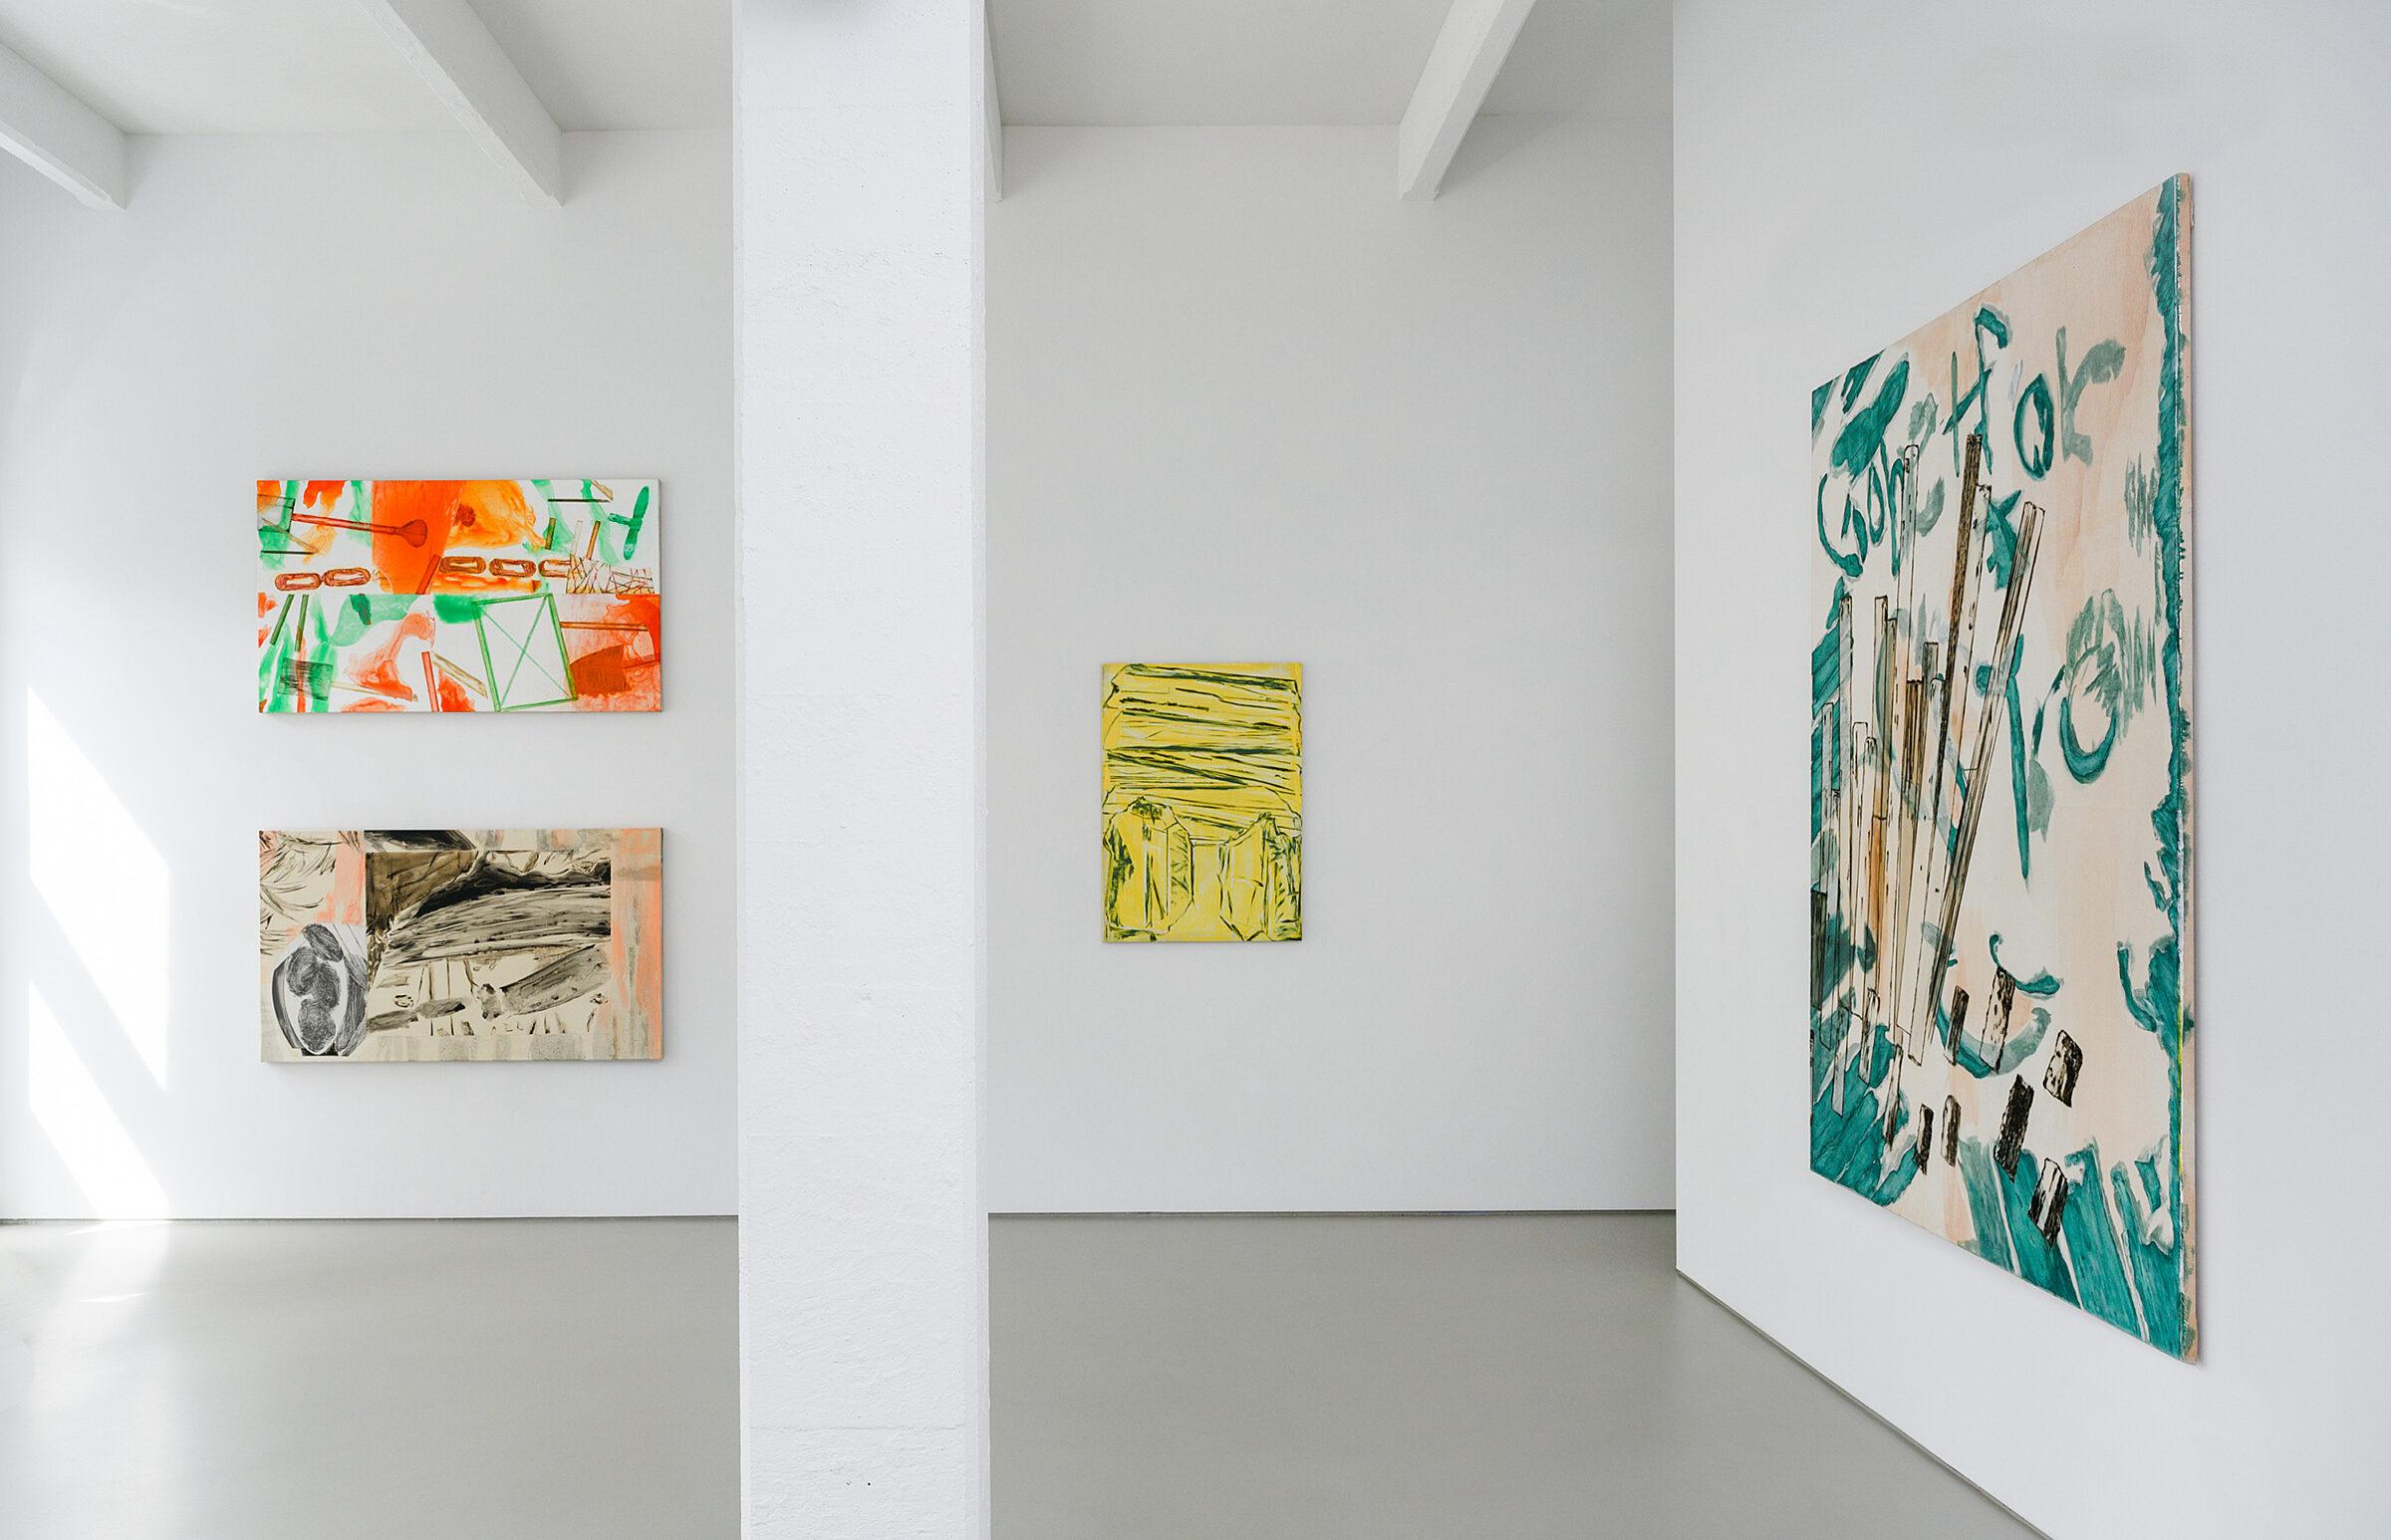 Toon-Verhoef-Galerie-Onrust-EX-2021-01